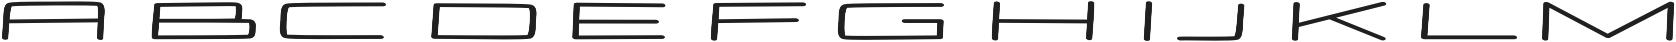 Stamina regular otf (400) Font LOWERCASE